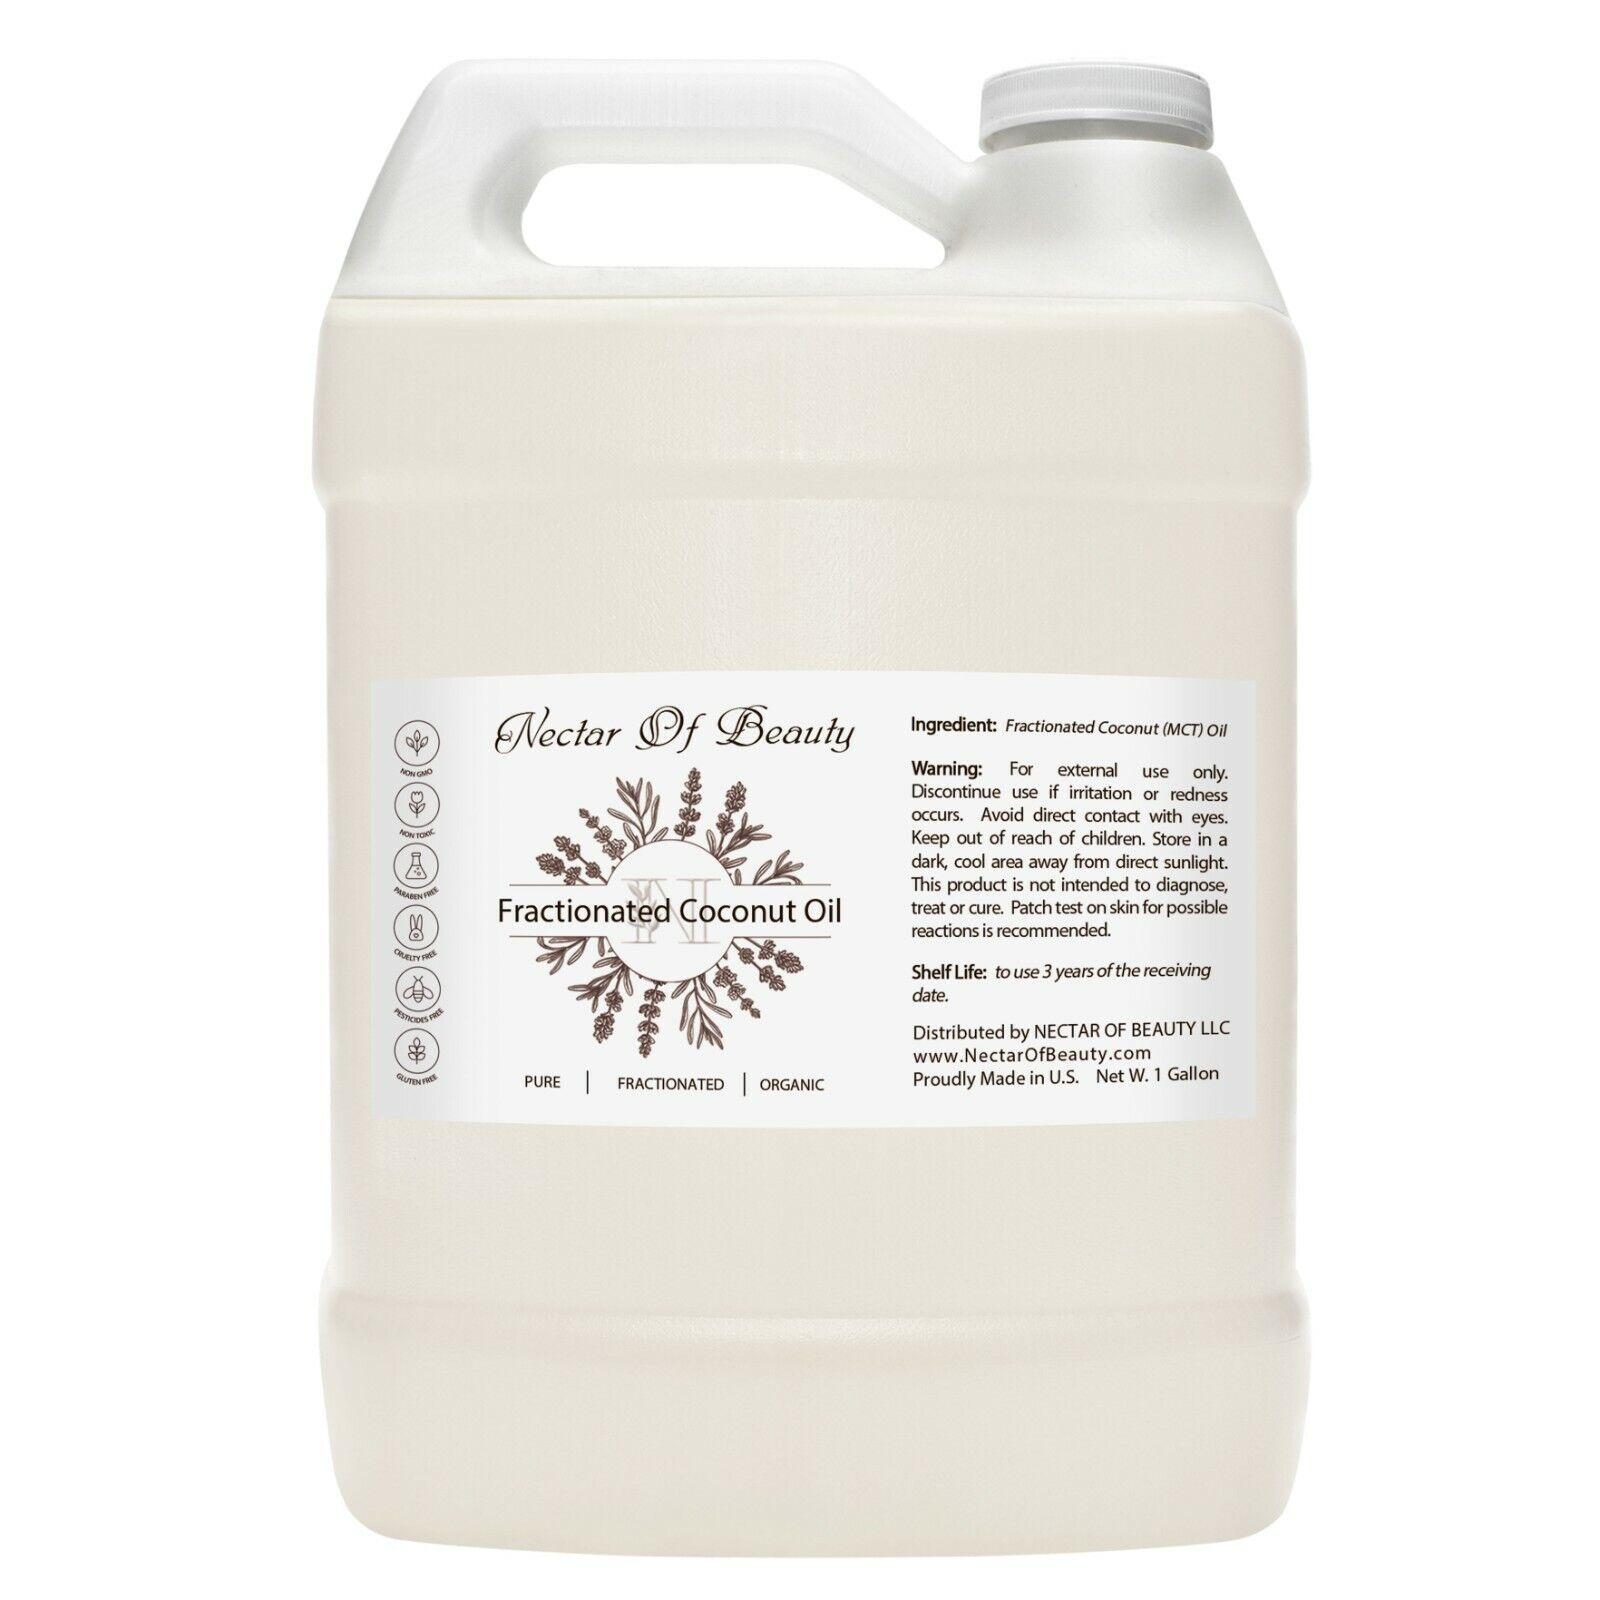 Mct oil organic 100% pure bulk non-gmo 32 oz  1 gallon fract